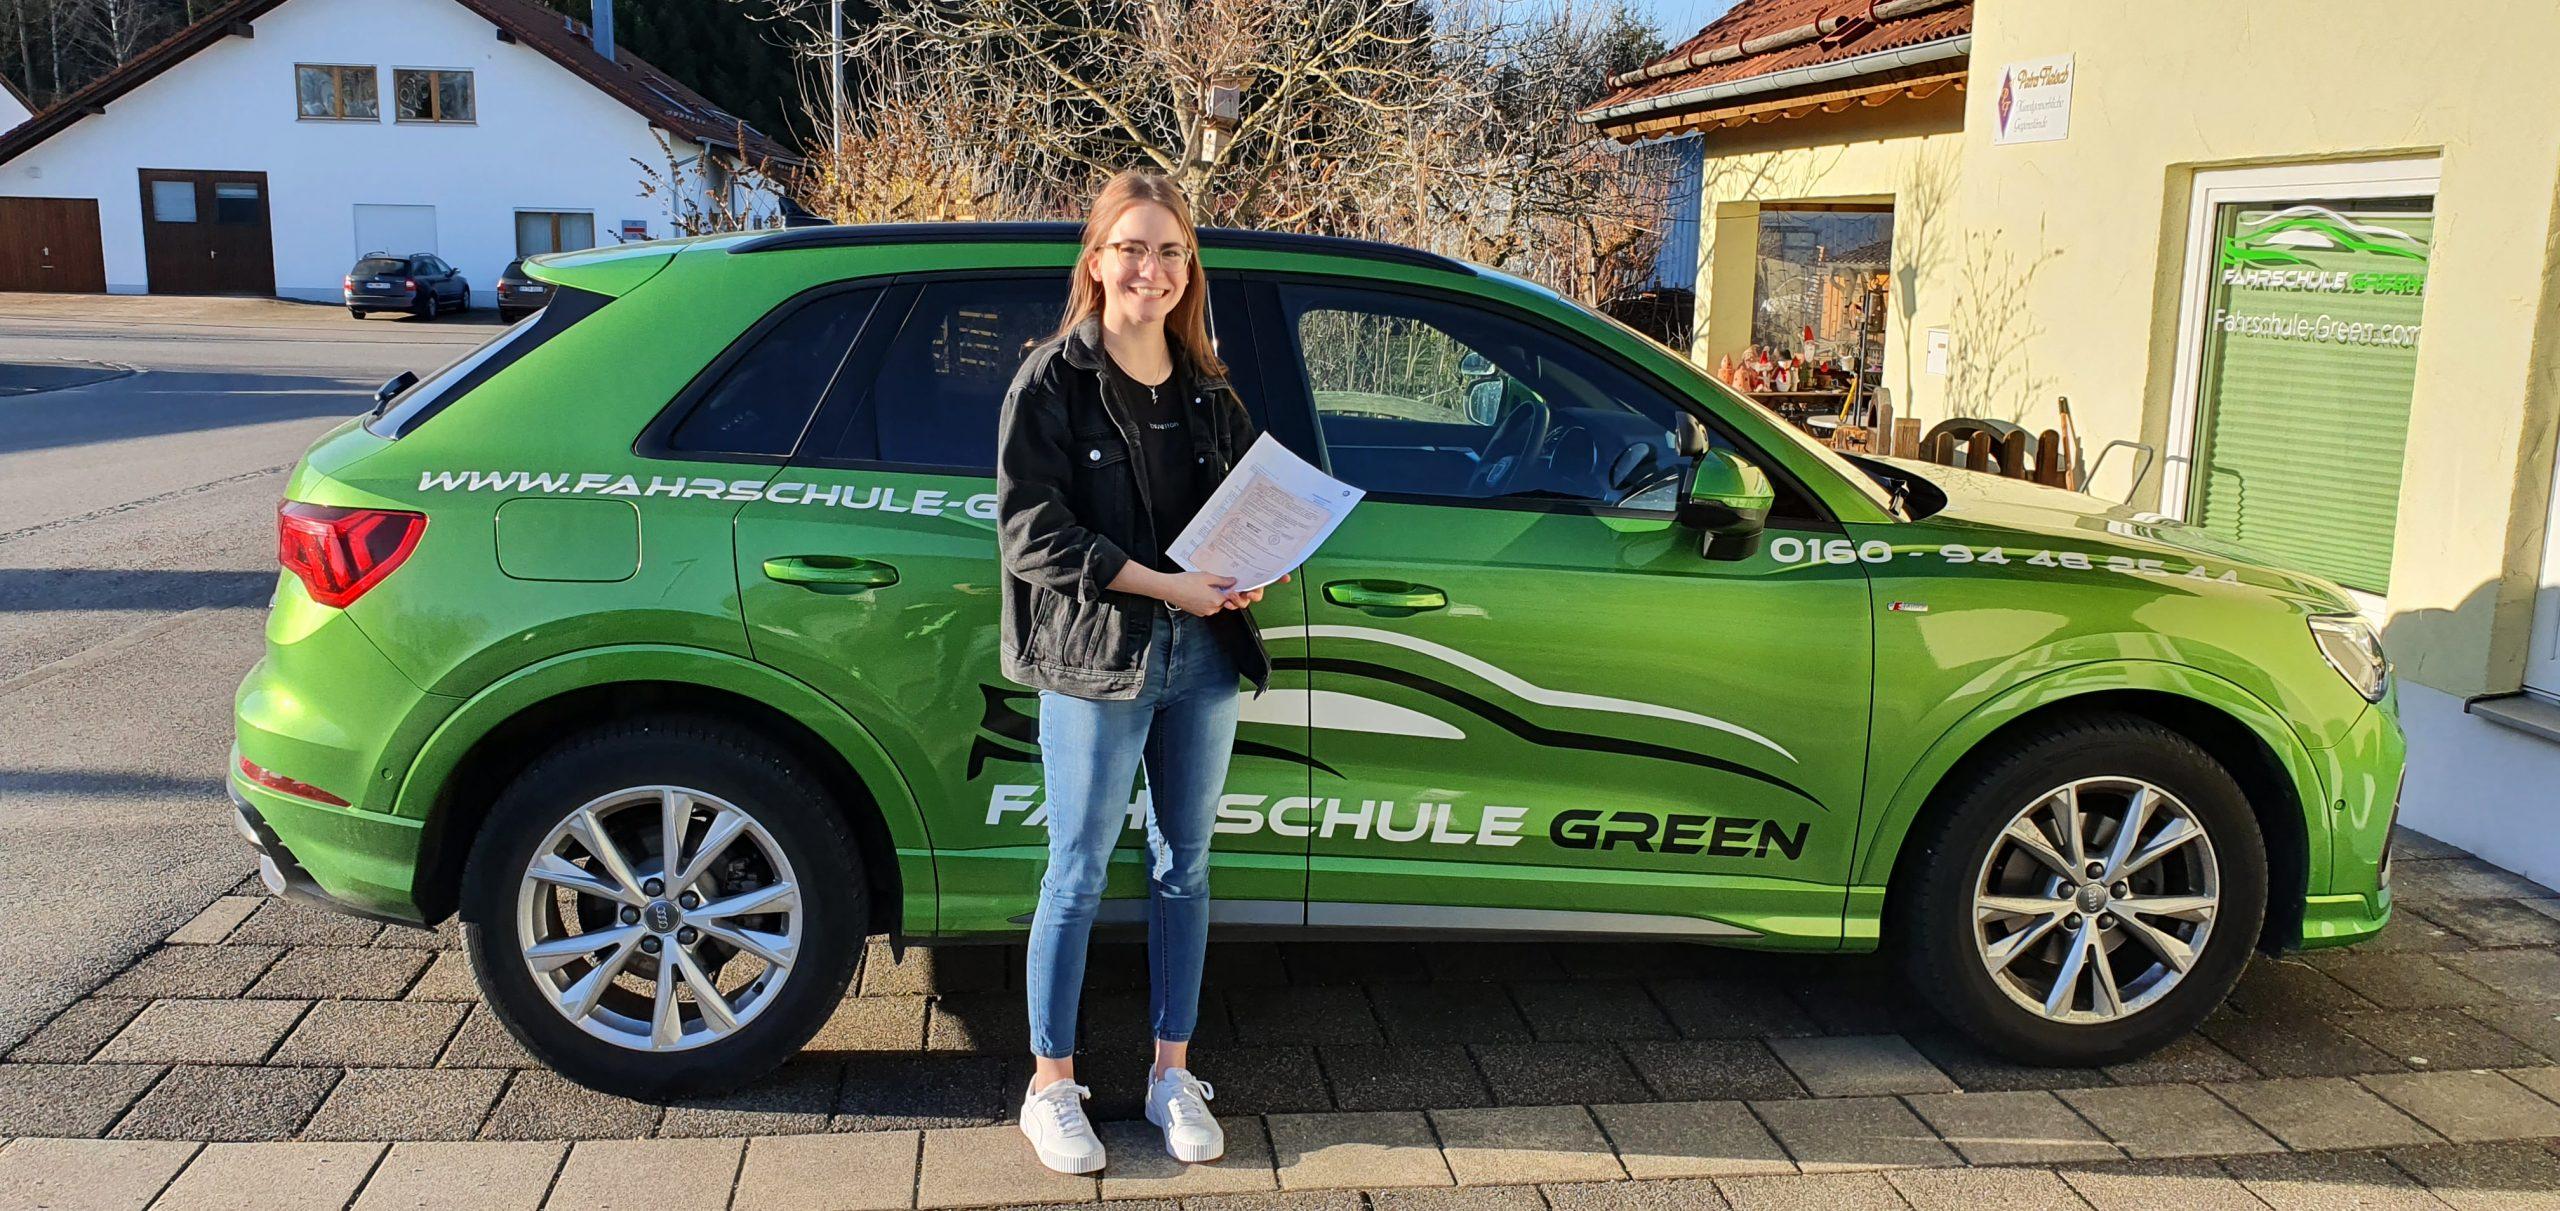 tabea-marie-leitl-pruefungen-2021-fahrschule-green-kaufbeuren-neugablonz